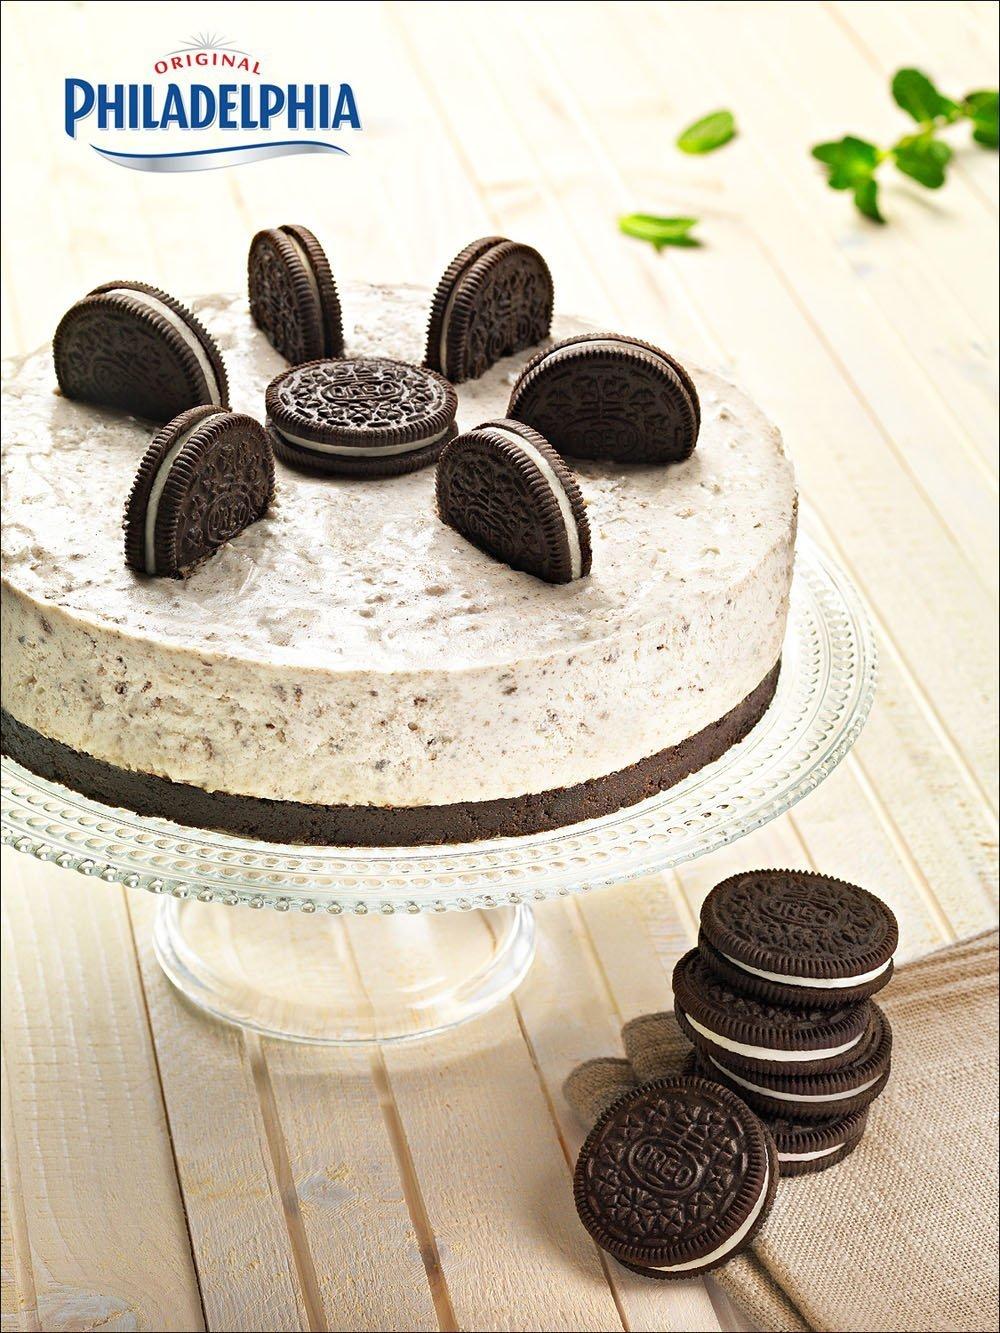 030-fotografo-food-gelato-dolci-cioccolato